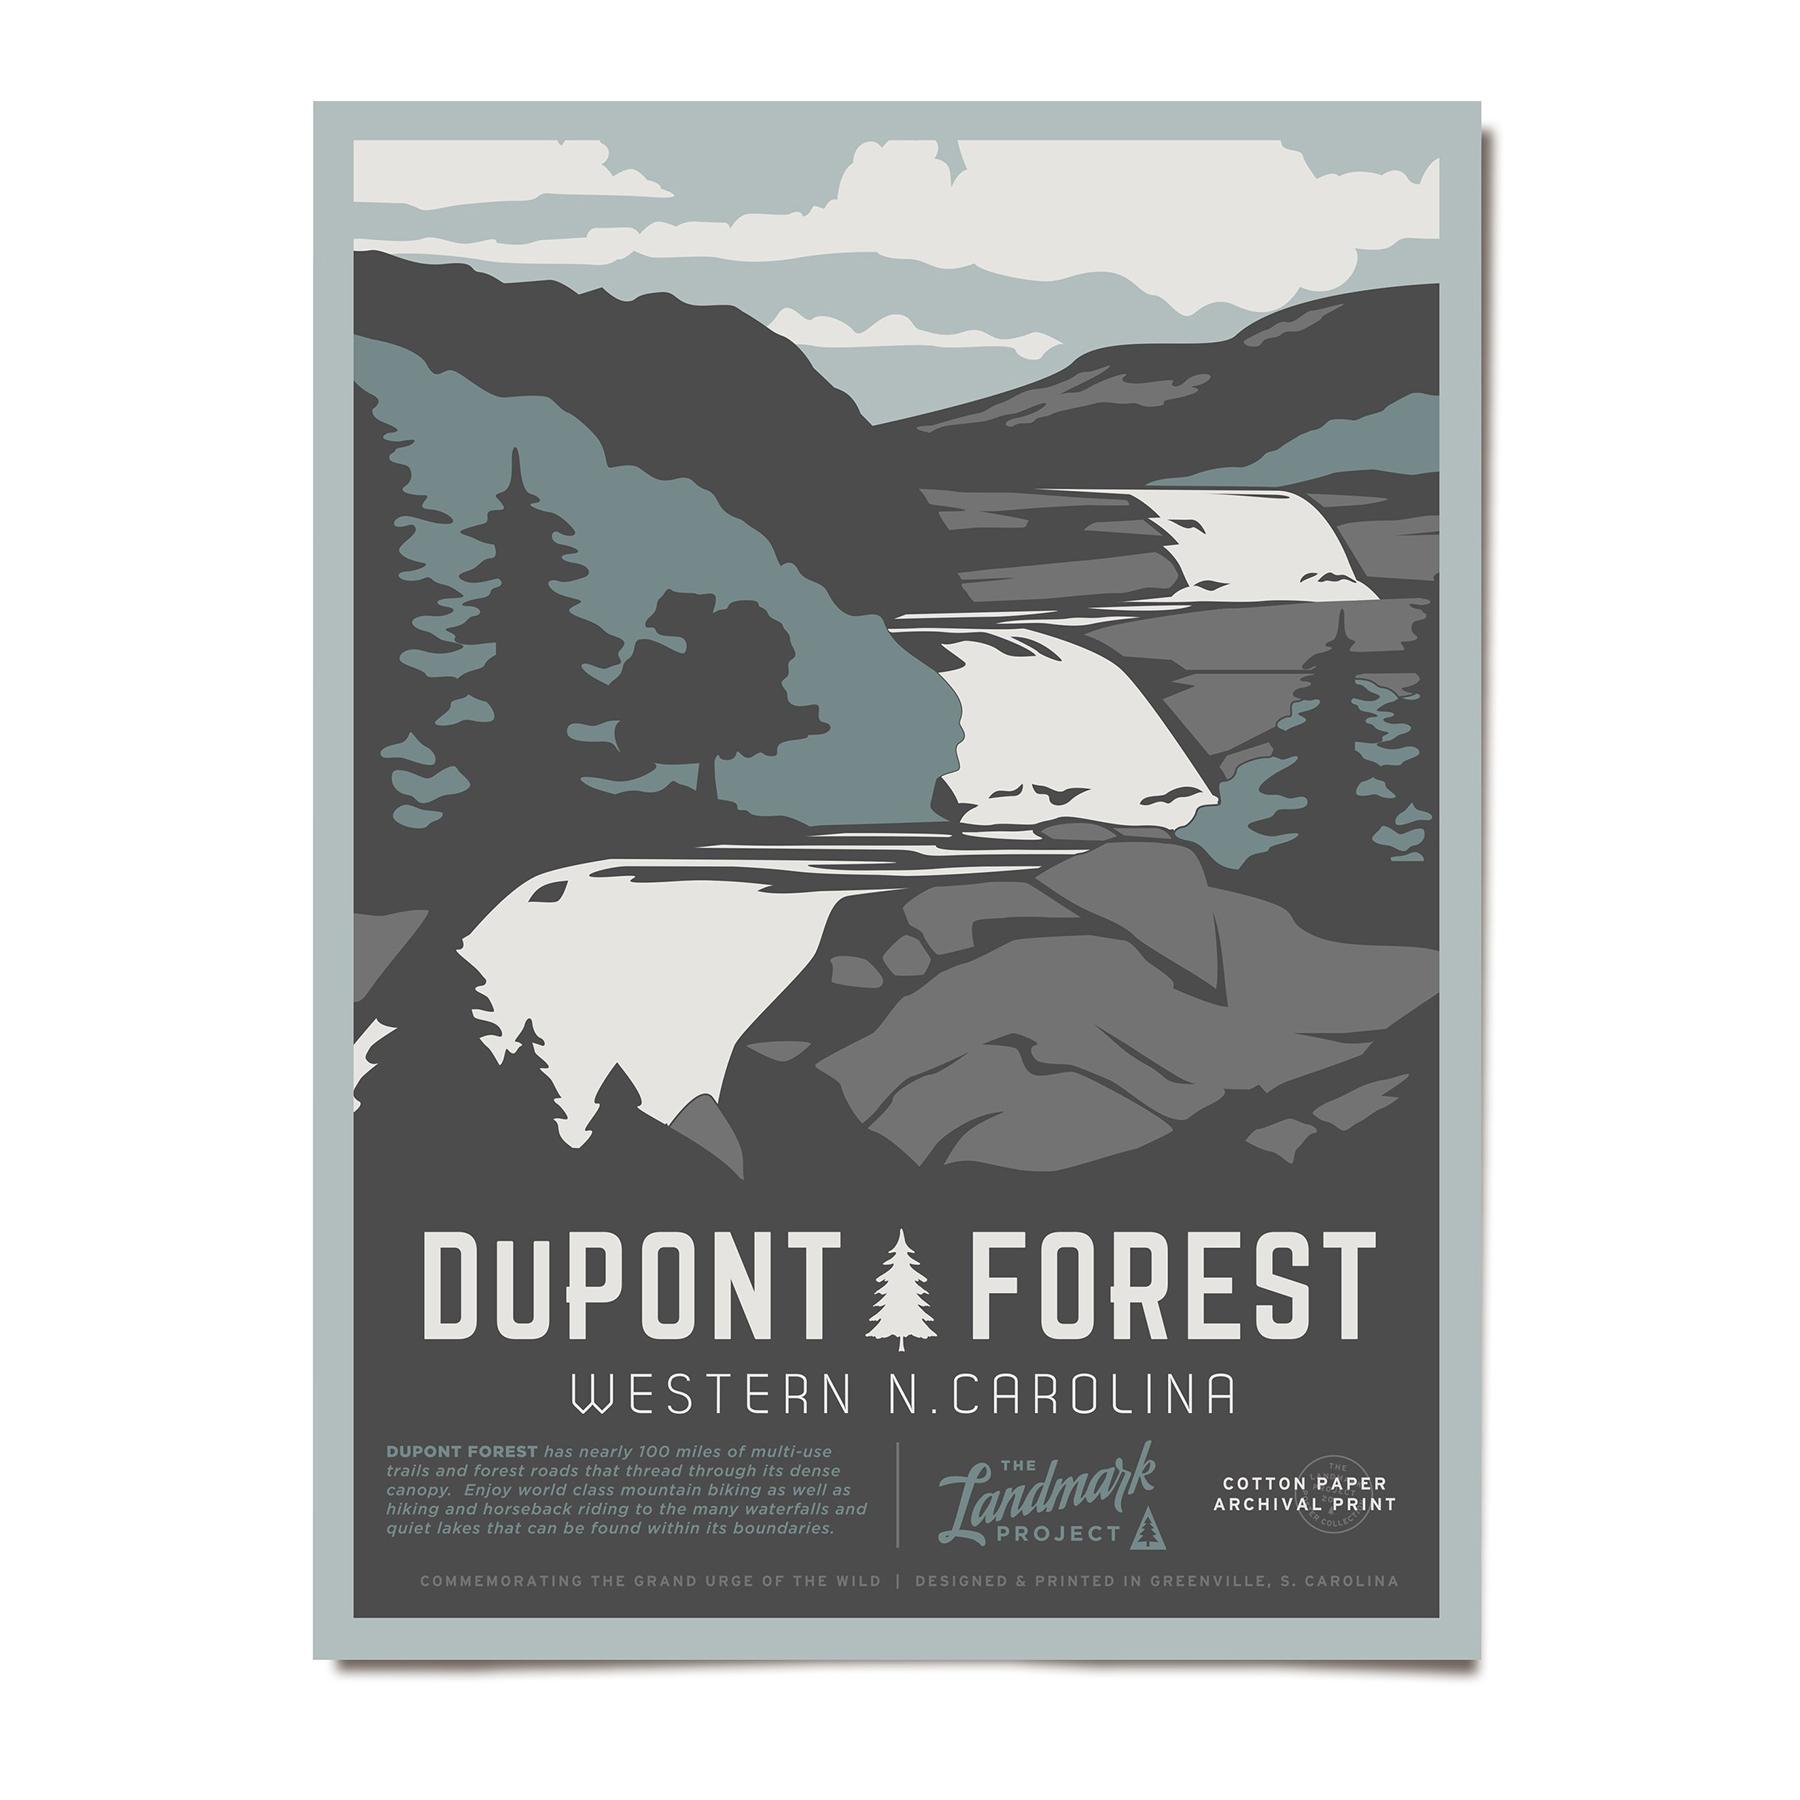 dupont-forest-poster.jpg